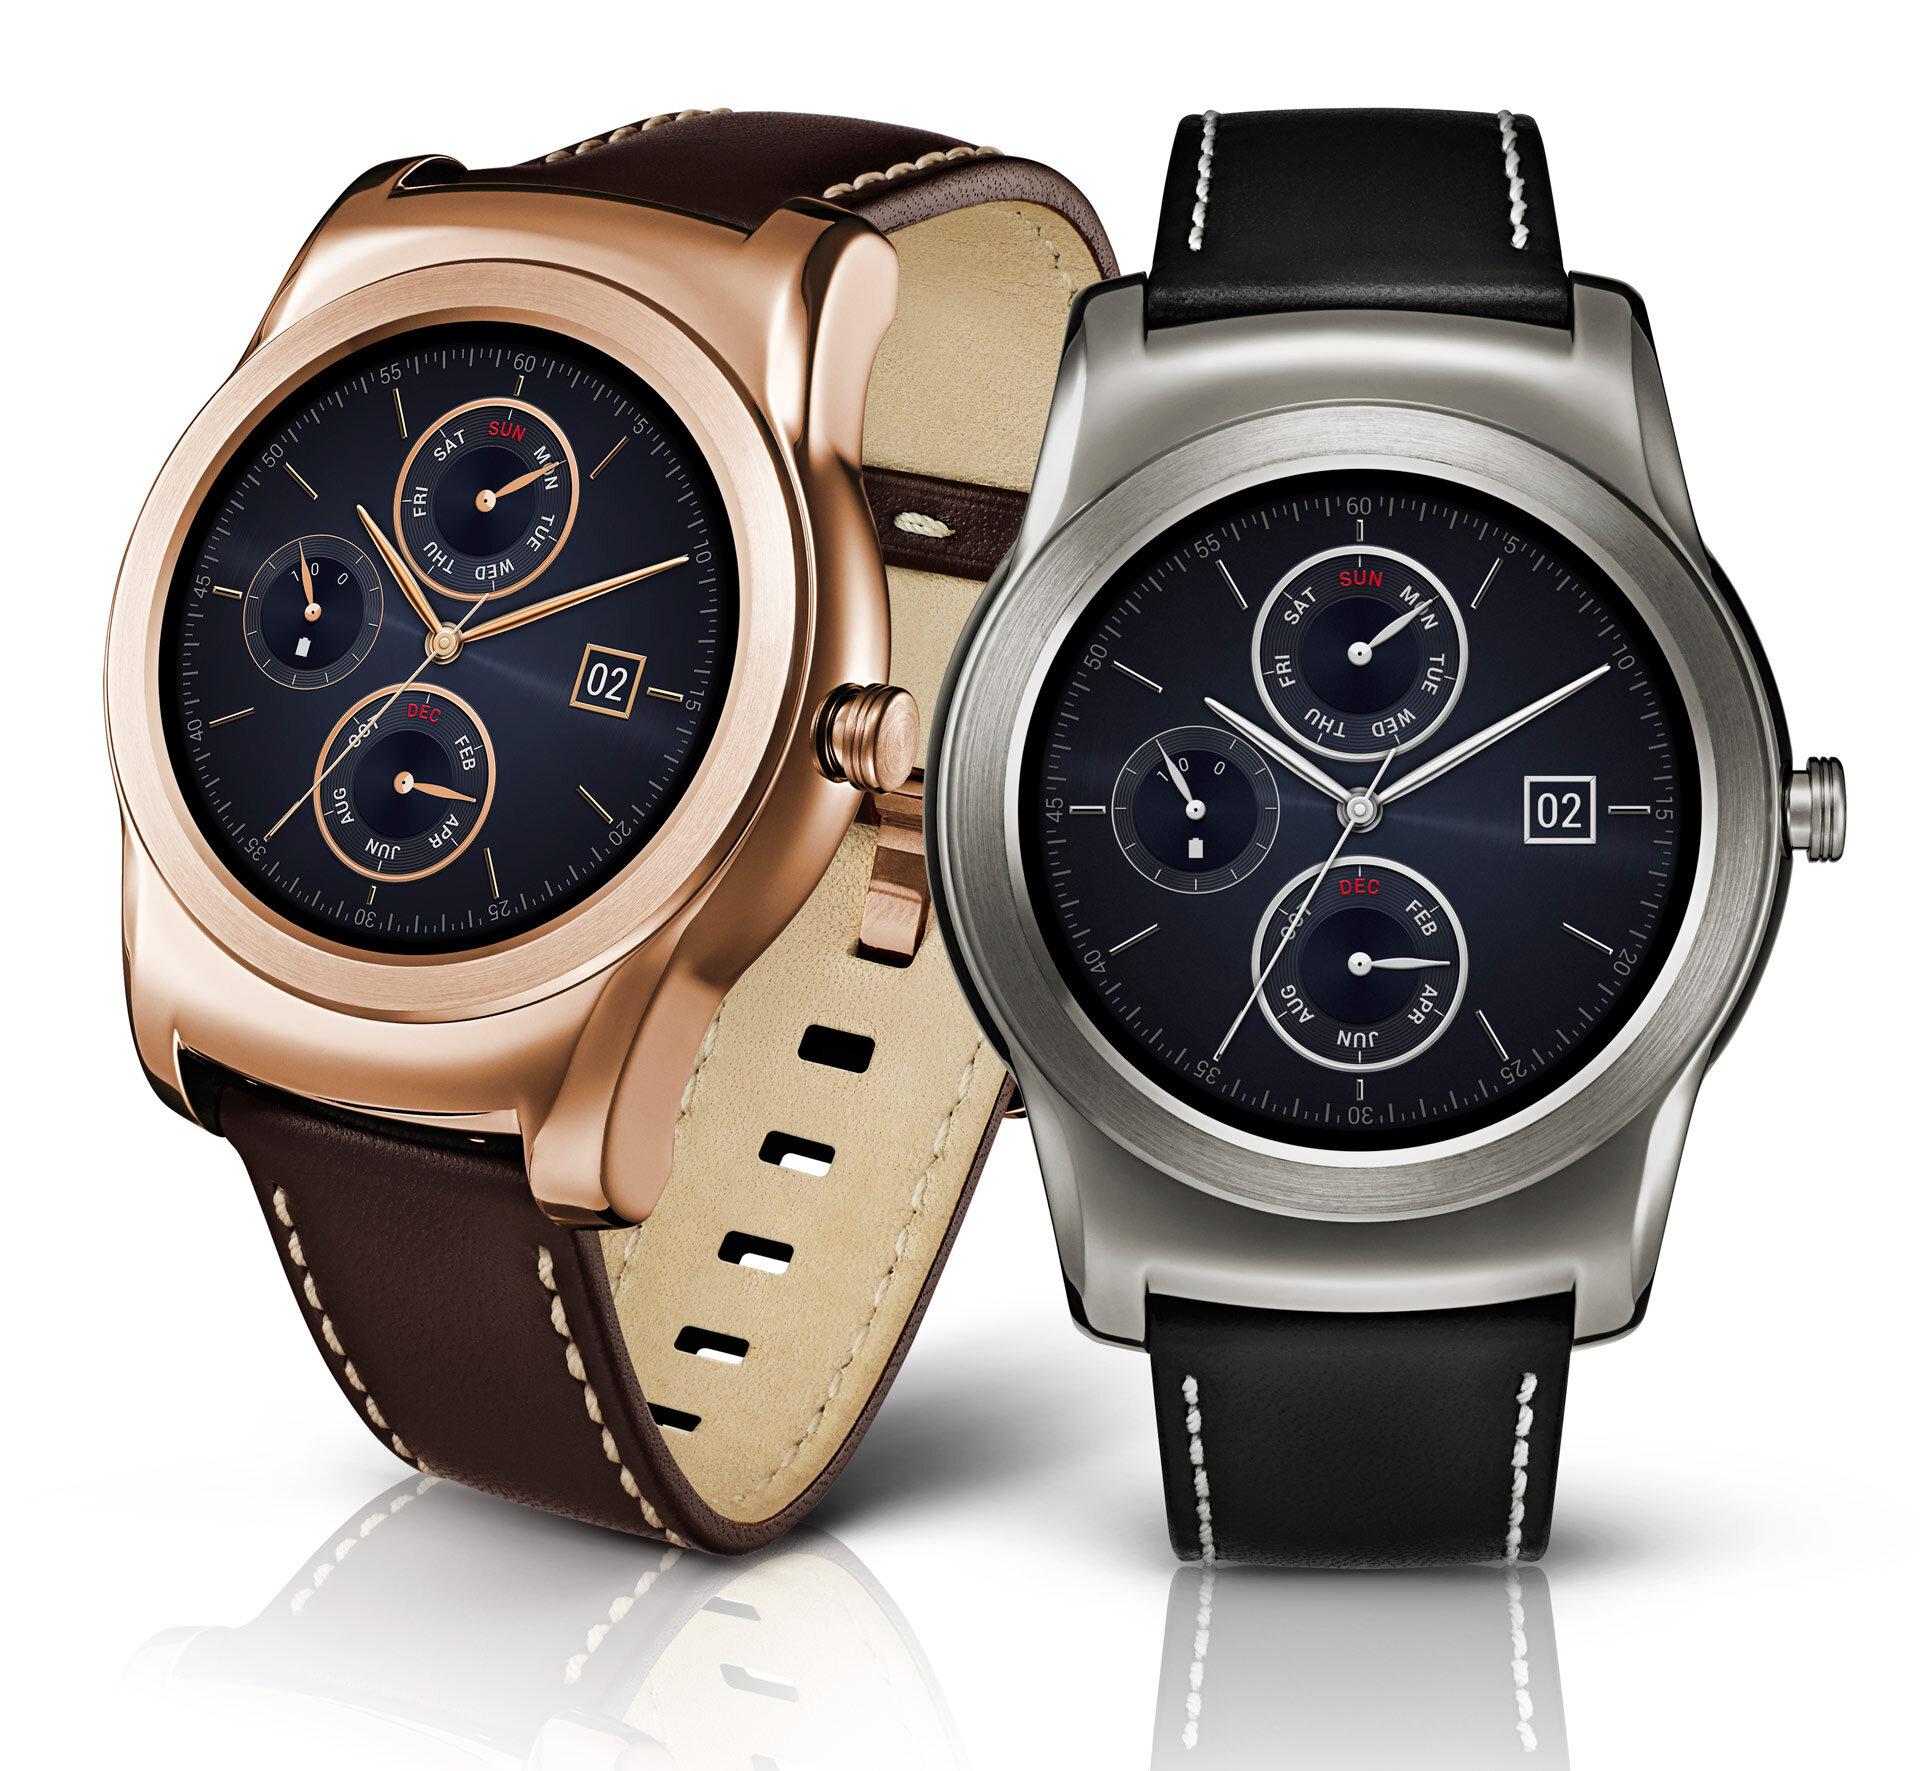 LG tung video giới thiệu smartwatch mới Watch Urbane